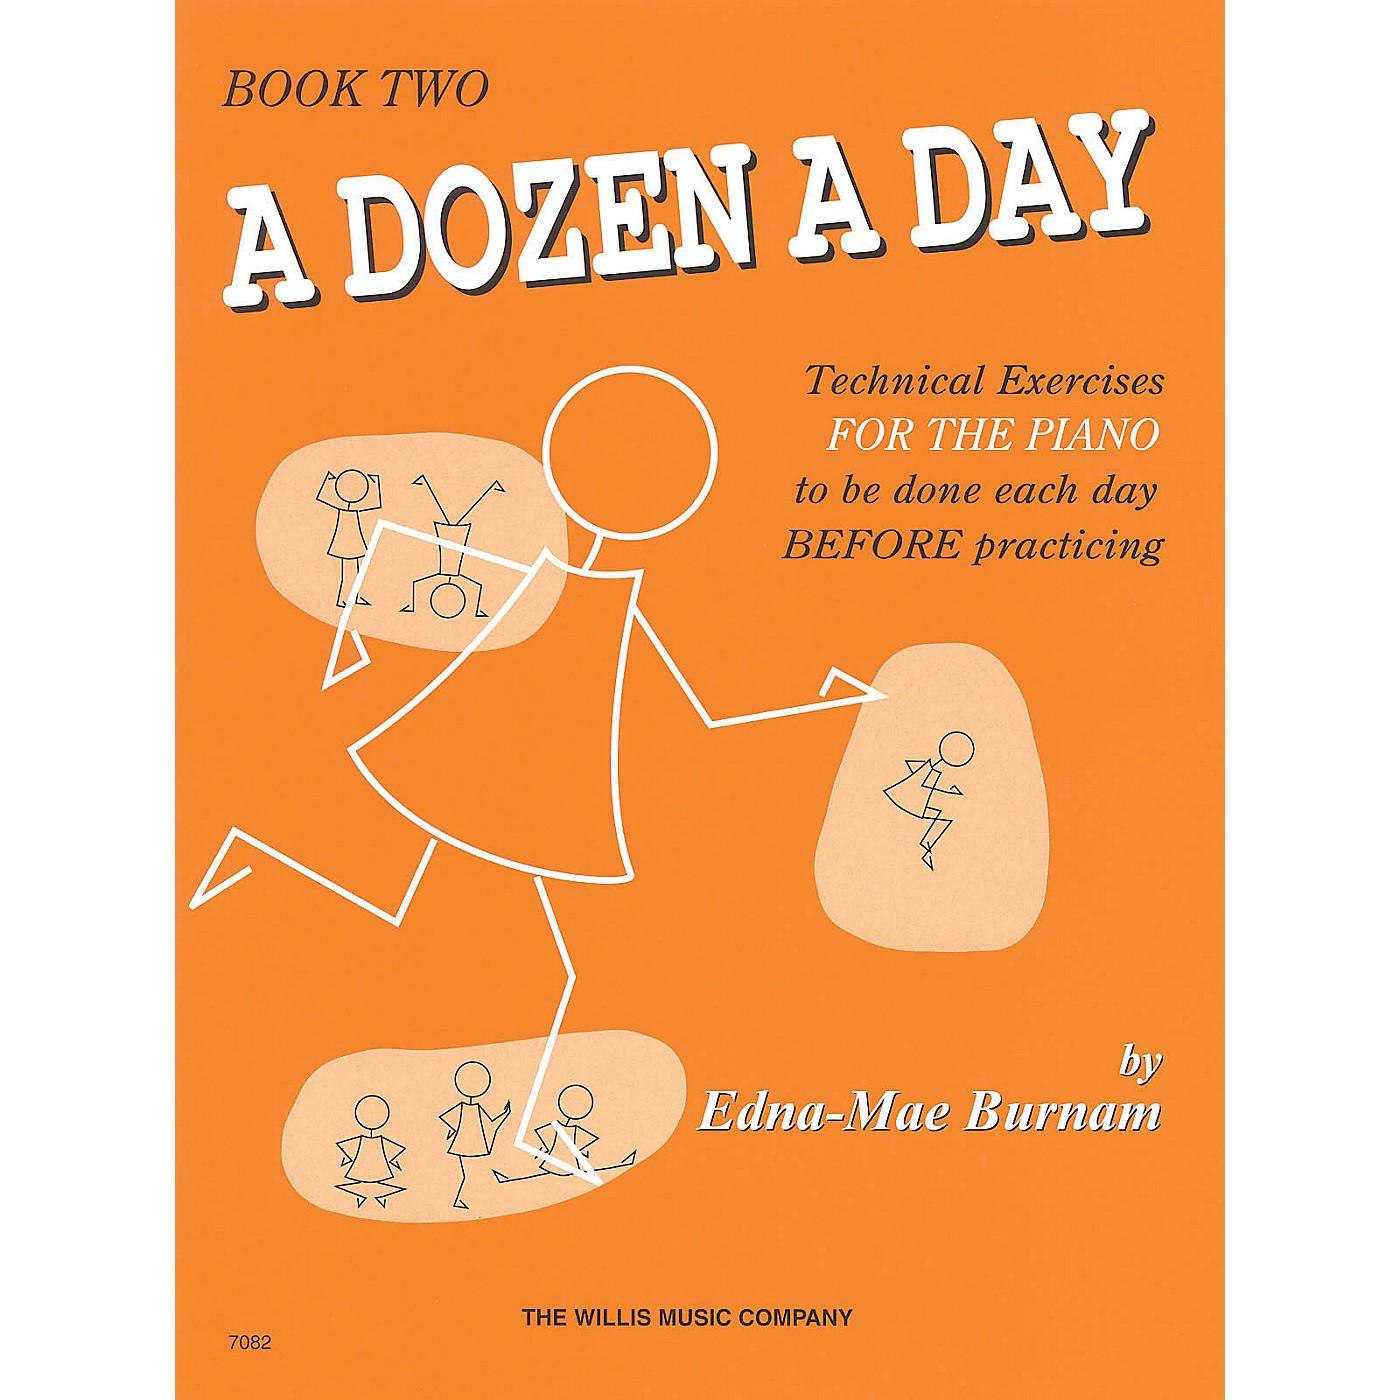 Hal Leonard A Dozen A Day Book 2 (Orange cover) thumbnail